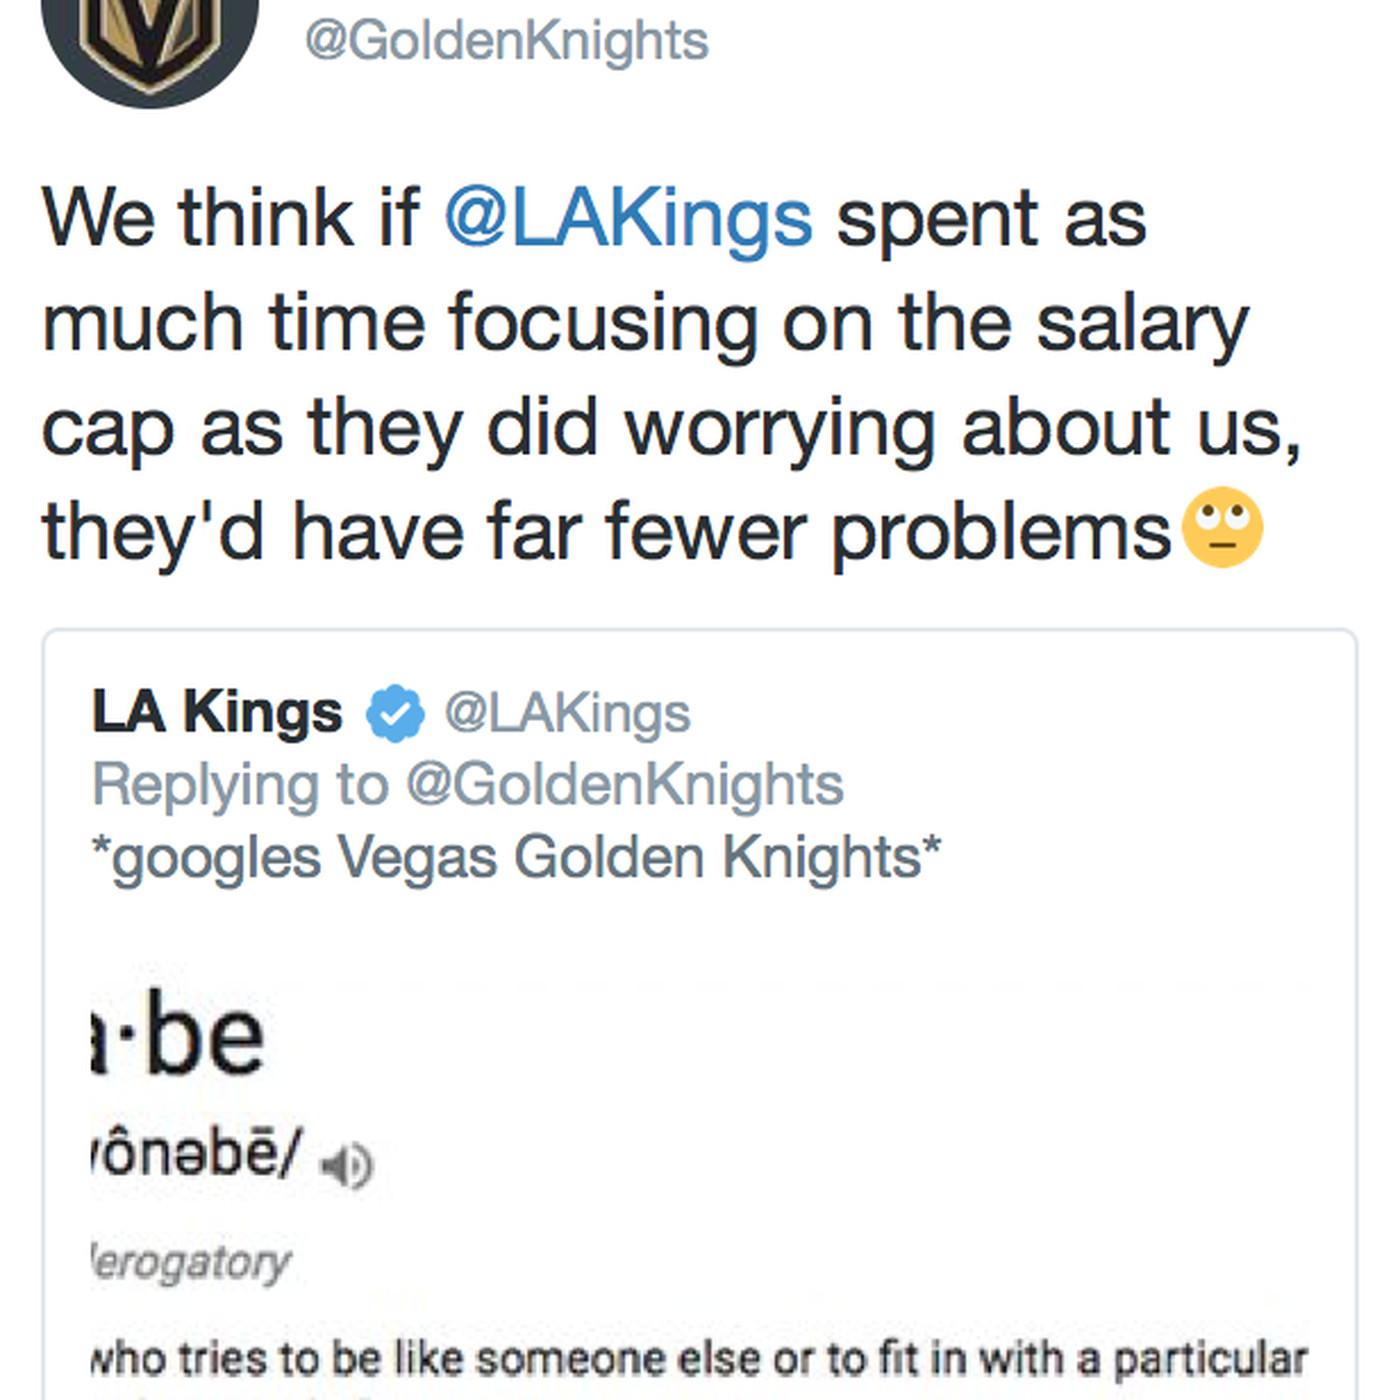 Vegas Golden Knights mock L A  Kings' poor cap management during